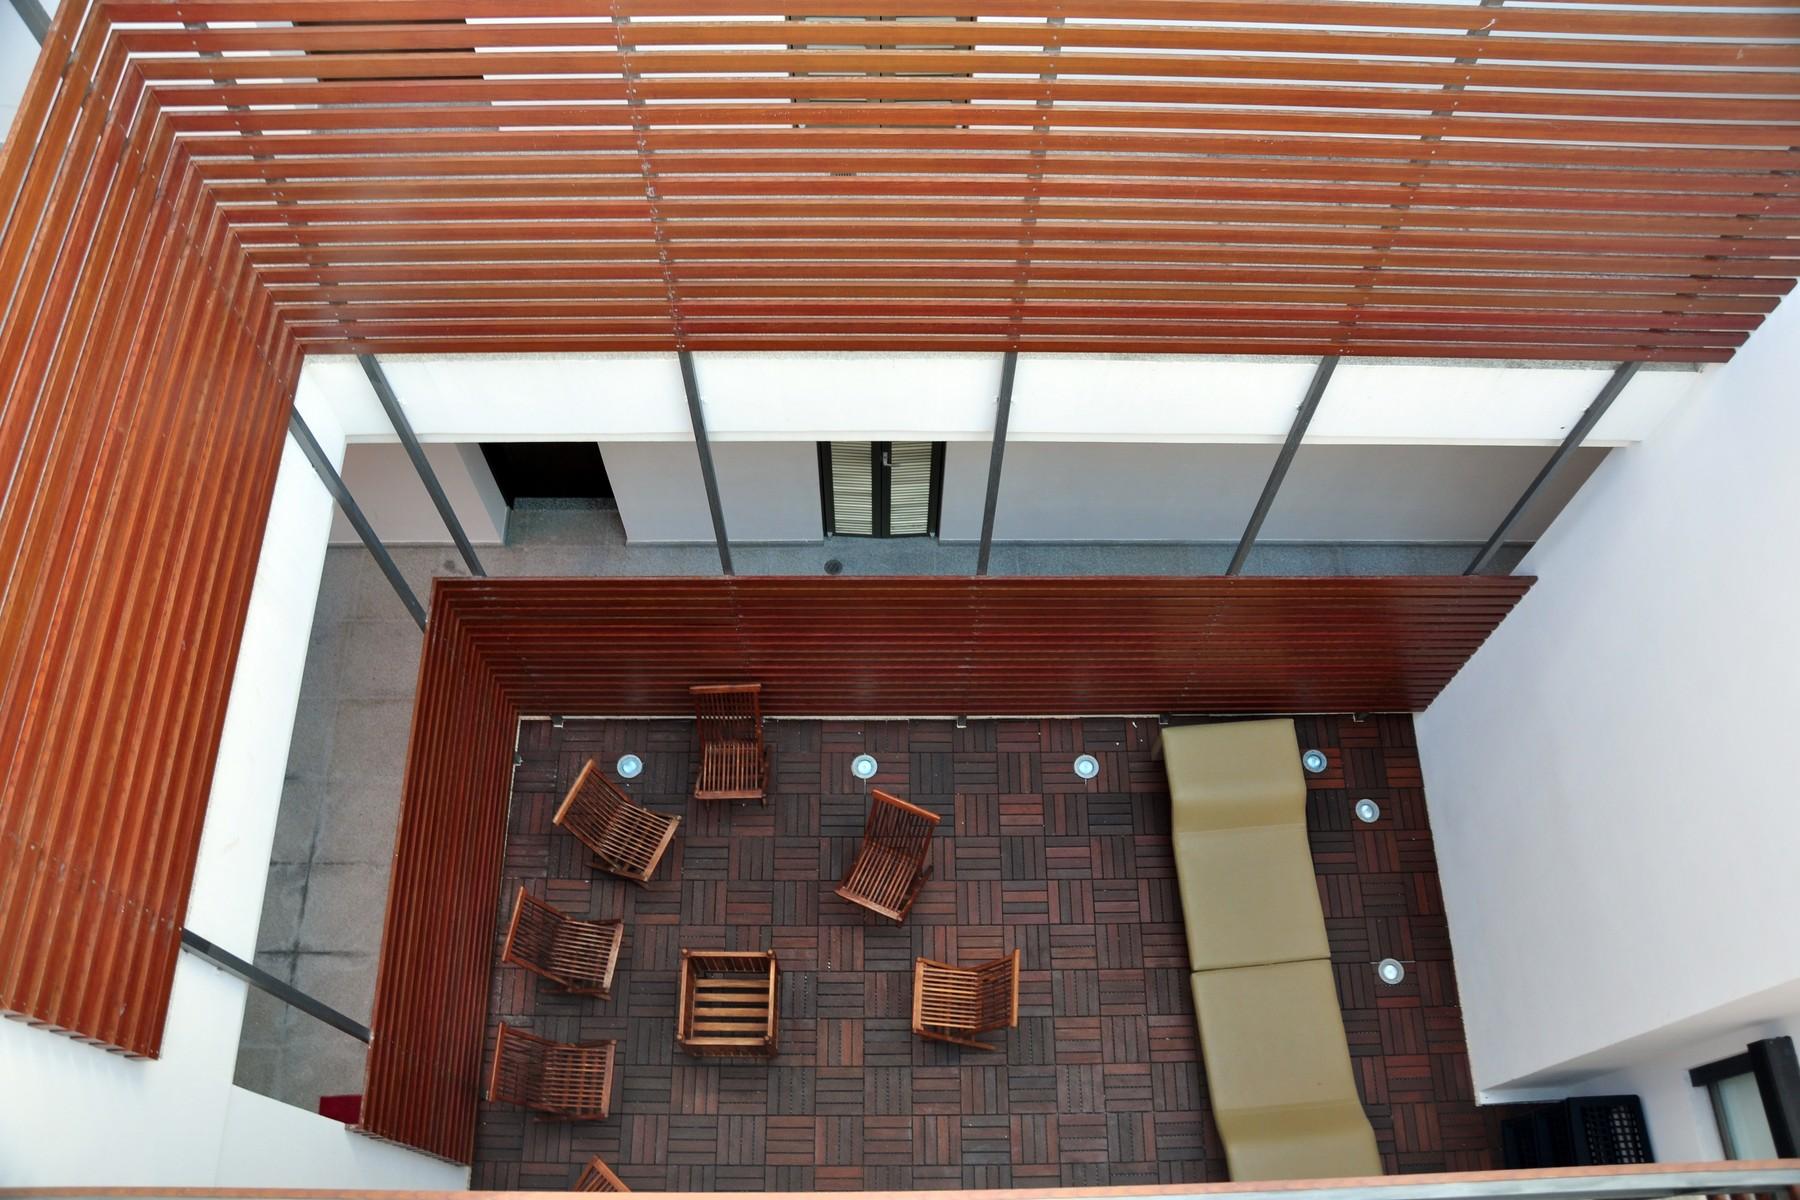 Property Of DELUXE 2 BEDROOM CONDO IN LITTLE ITALY